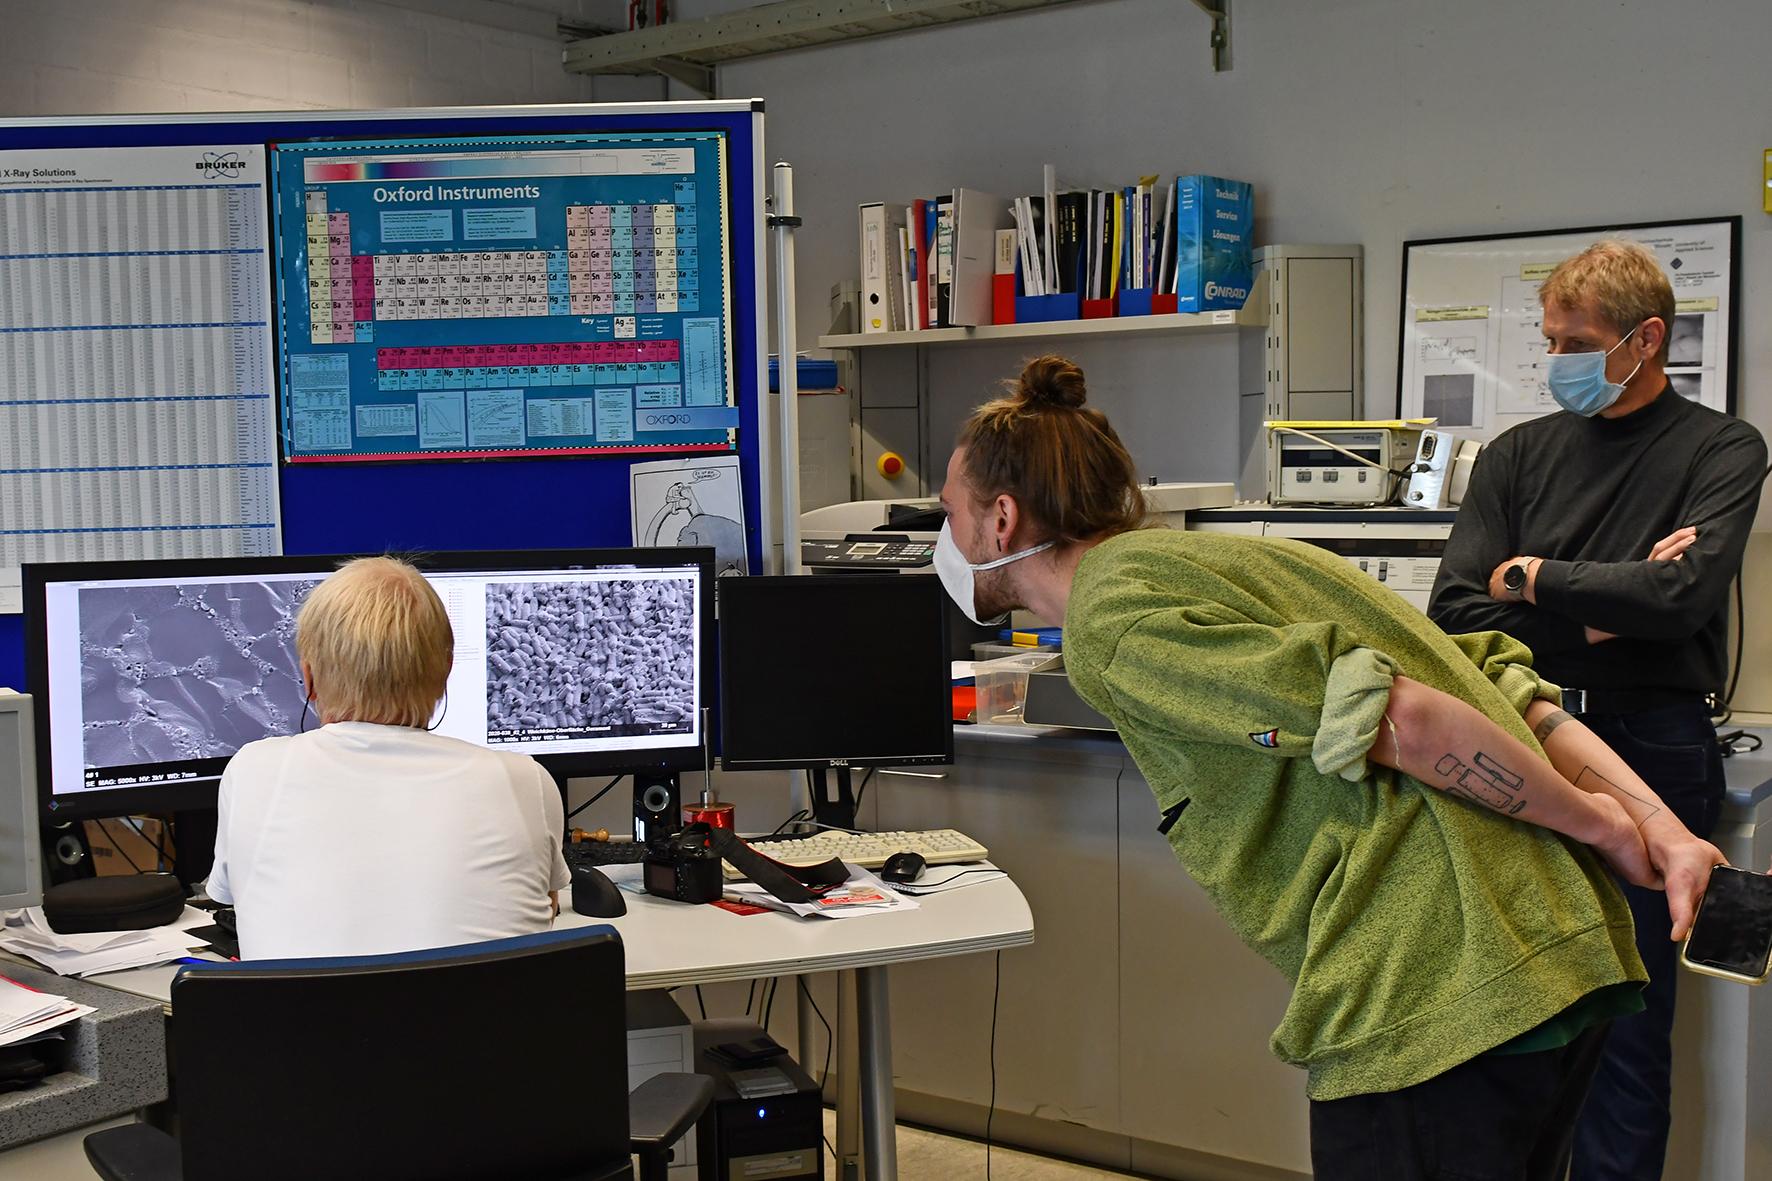 Holger Uphoff, Jonas Berger und Prof. Dr. Hans-Christoph Mertins vor den Forschungsergebnissen